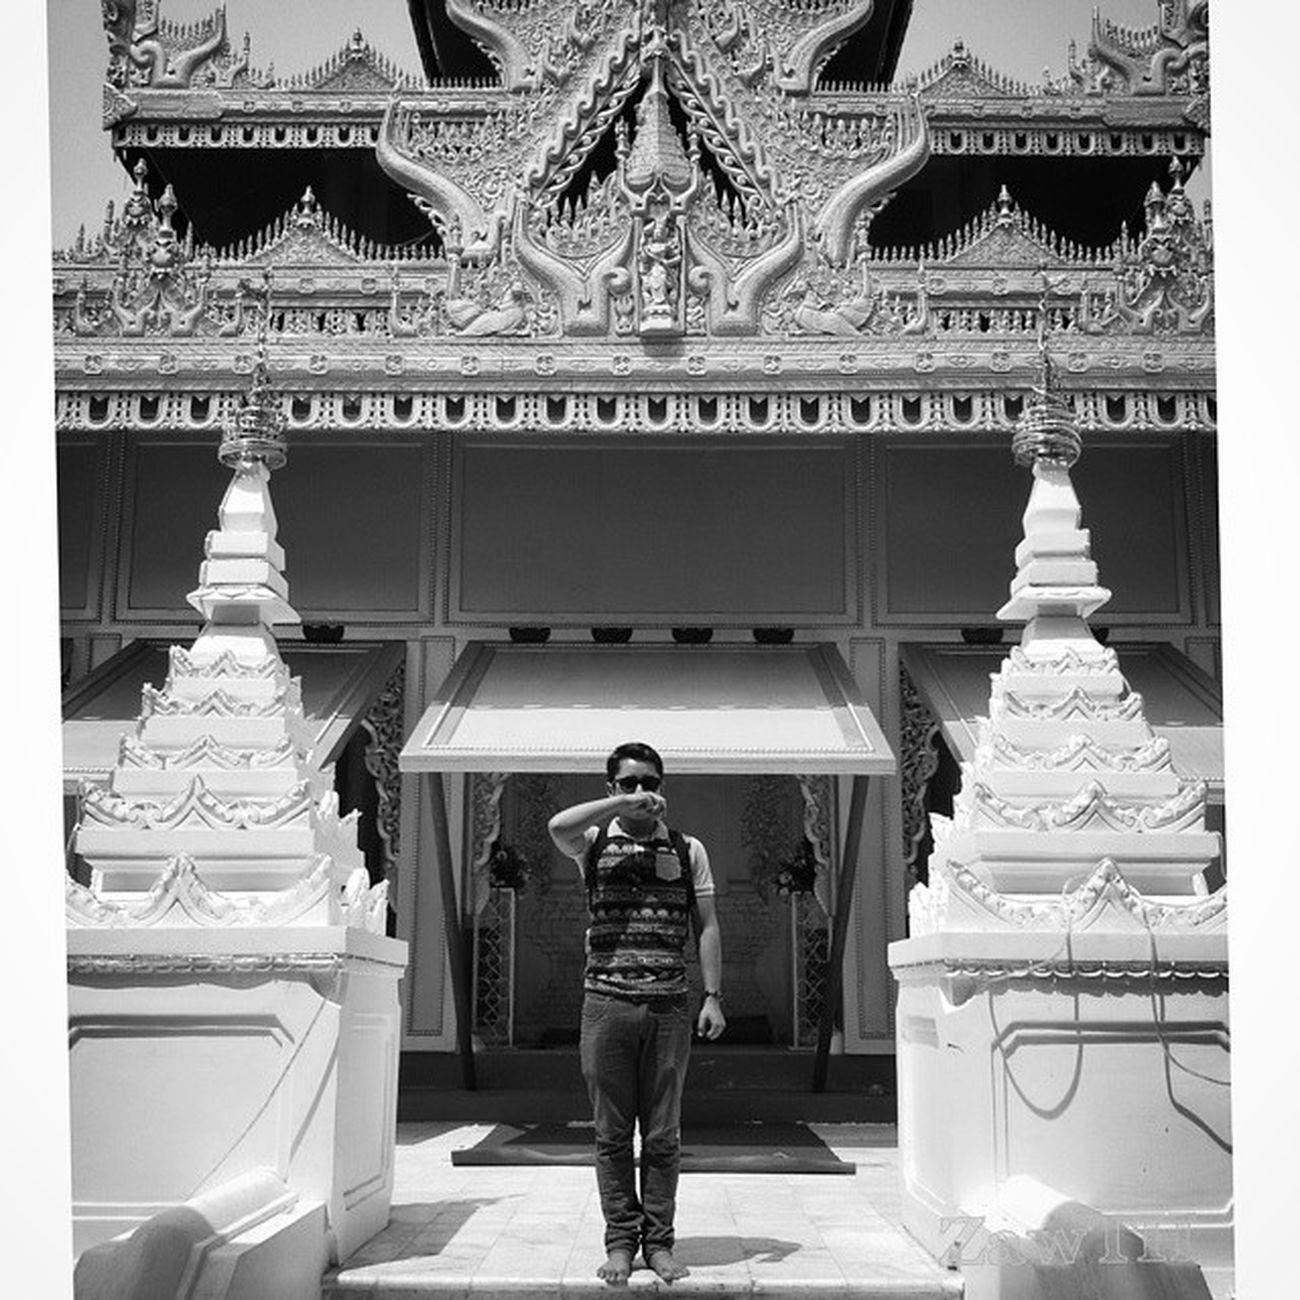 Morning igers. Morning Myanmar Myanmarphotos Mandalay Burma Burmeseigers Burmesearchitecture Burmeseboy ASIA Stunning_shots Hot_shotz Instalife_shot Igglobal Igguy Ig_photo_life Blackandwhite Buddhist Nepaleseguy Asianguy Photooftheday Princely_shotz Igersmyanmar PhonePhotography Monastery Igersmandalay temple goldenland galaxygrand2 zawth